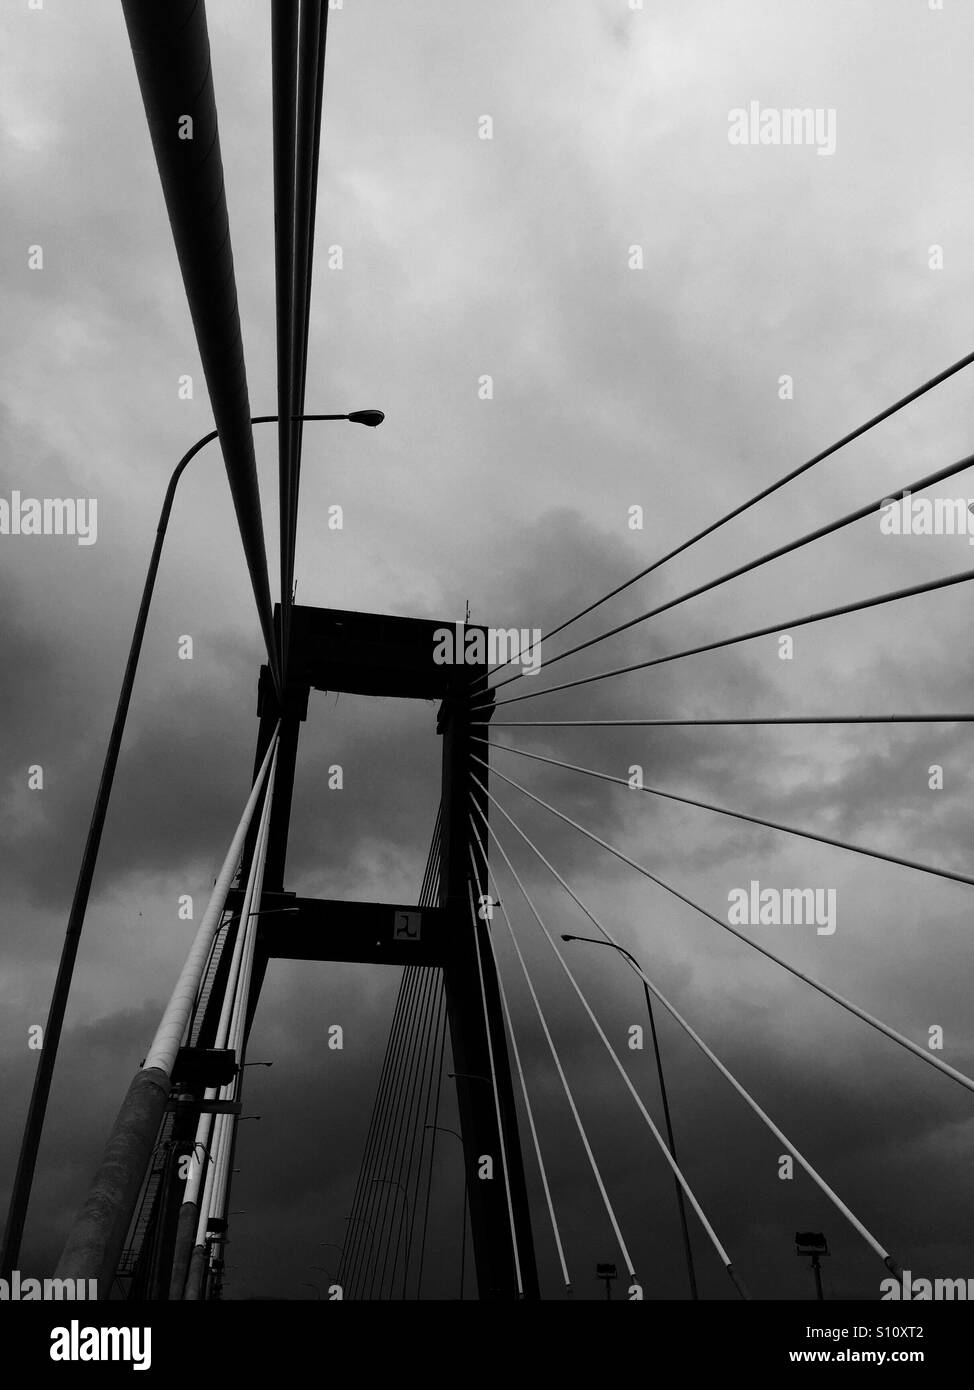 Sukarno Bridge, Manado, North Sulawesi, Indonesia - Stock Image